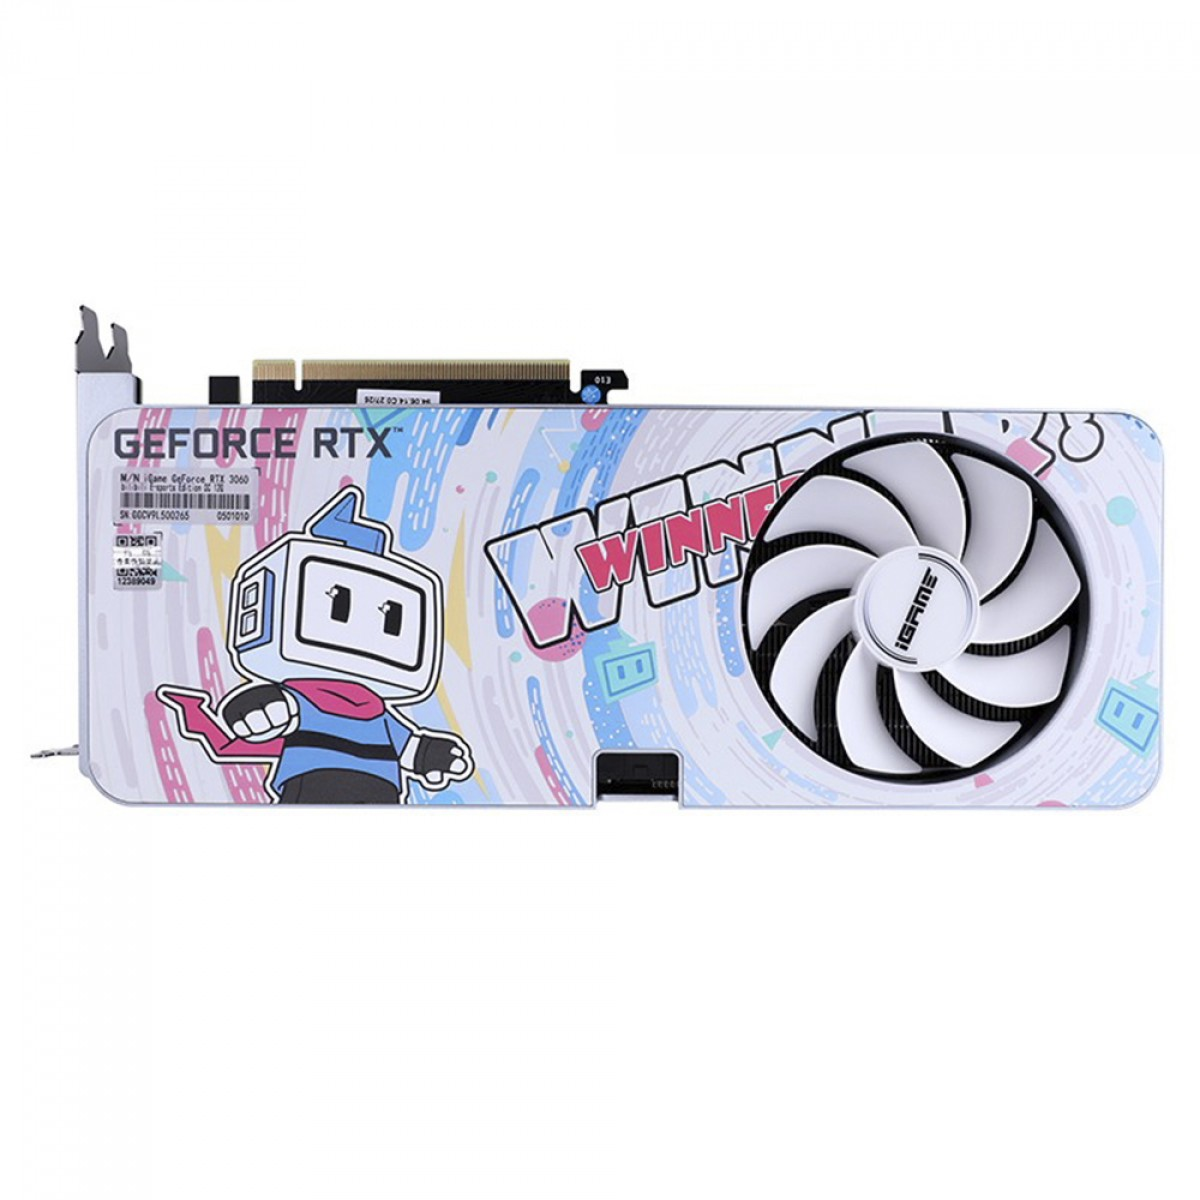 Placa de Vídeo Colorful, GeForce, iGame RTX 3060 Bilibili E-sports Edition, LHR, OC 12G-V, GDDR6, DLSS, Ray Tracing